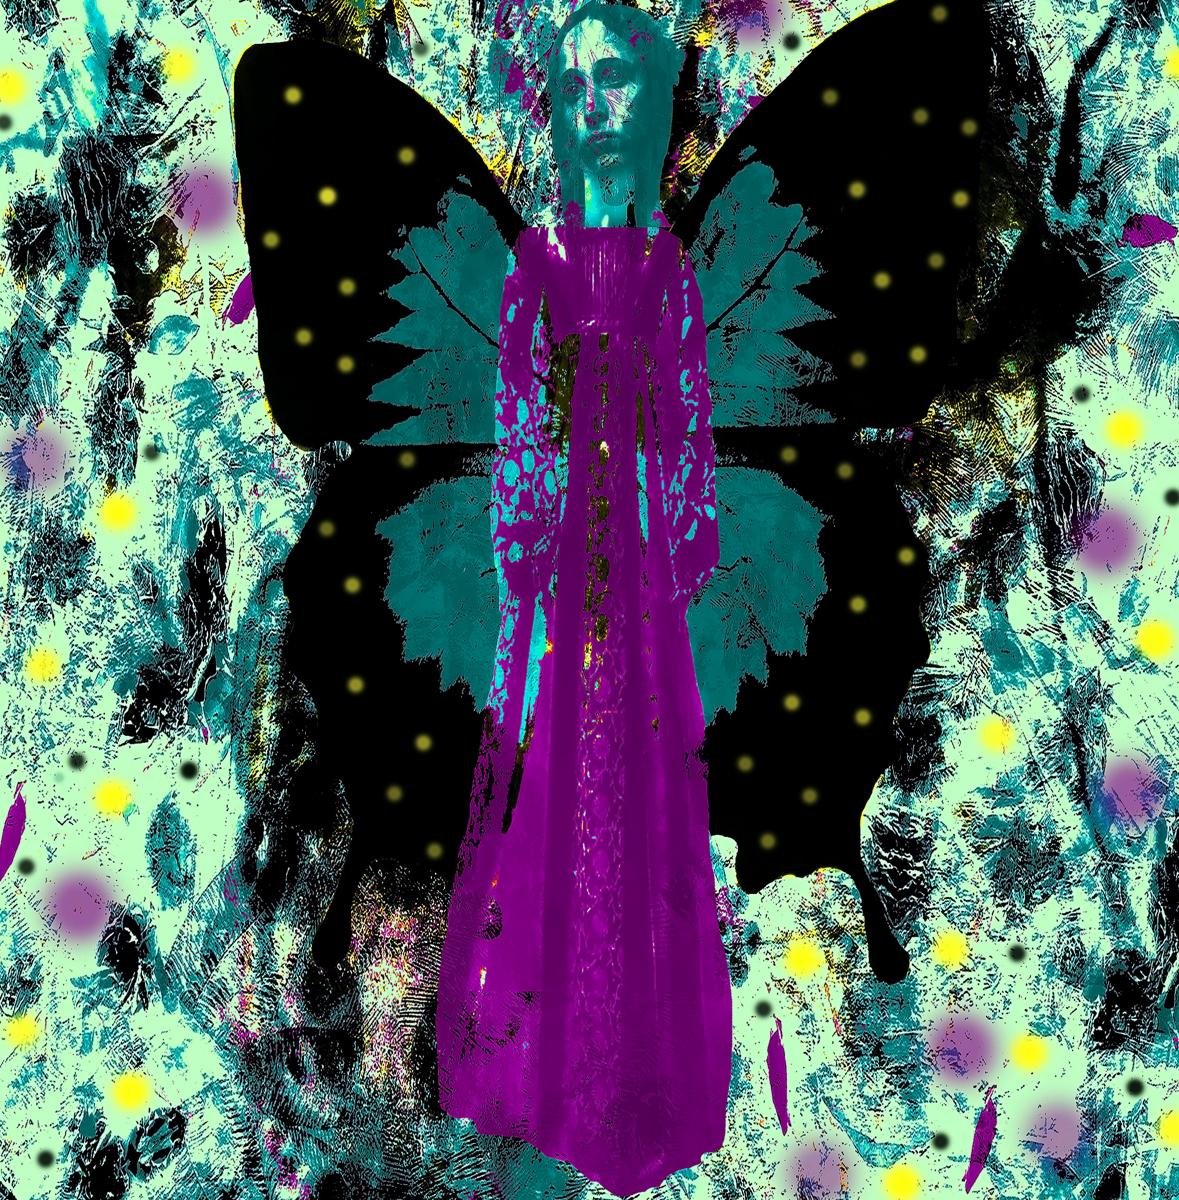 Bleeding Heart, Paper Wings 1 (large view)